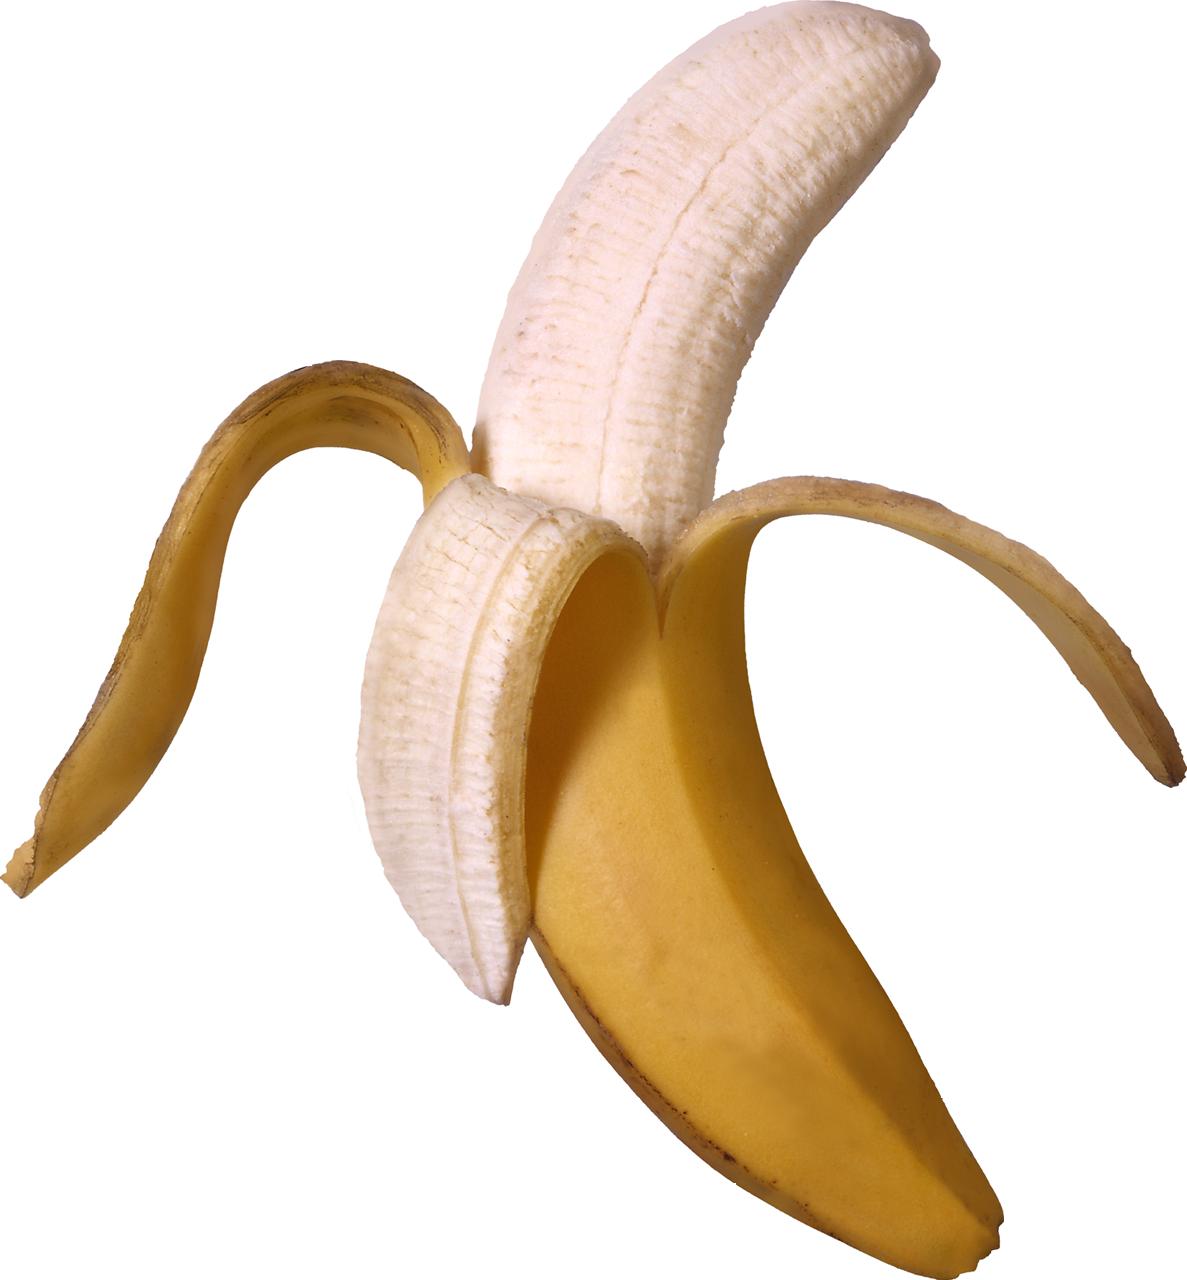 Фото банан в censored у мужчин 5 фотография